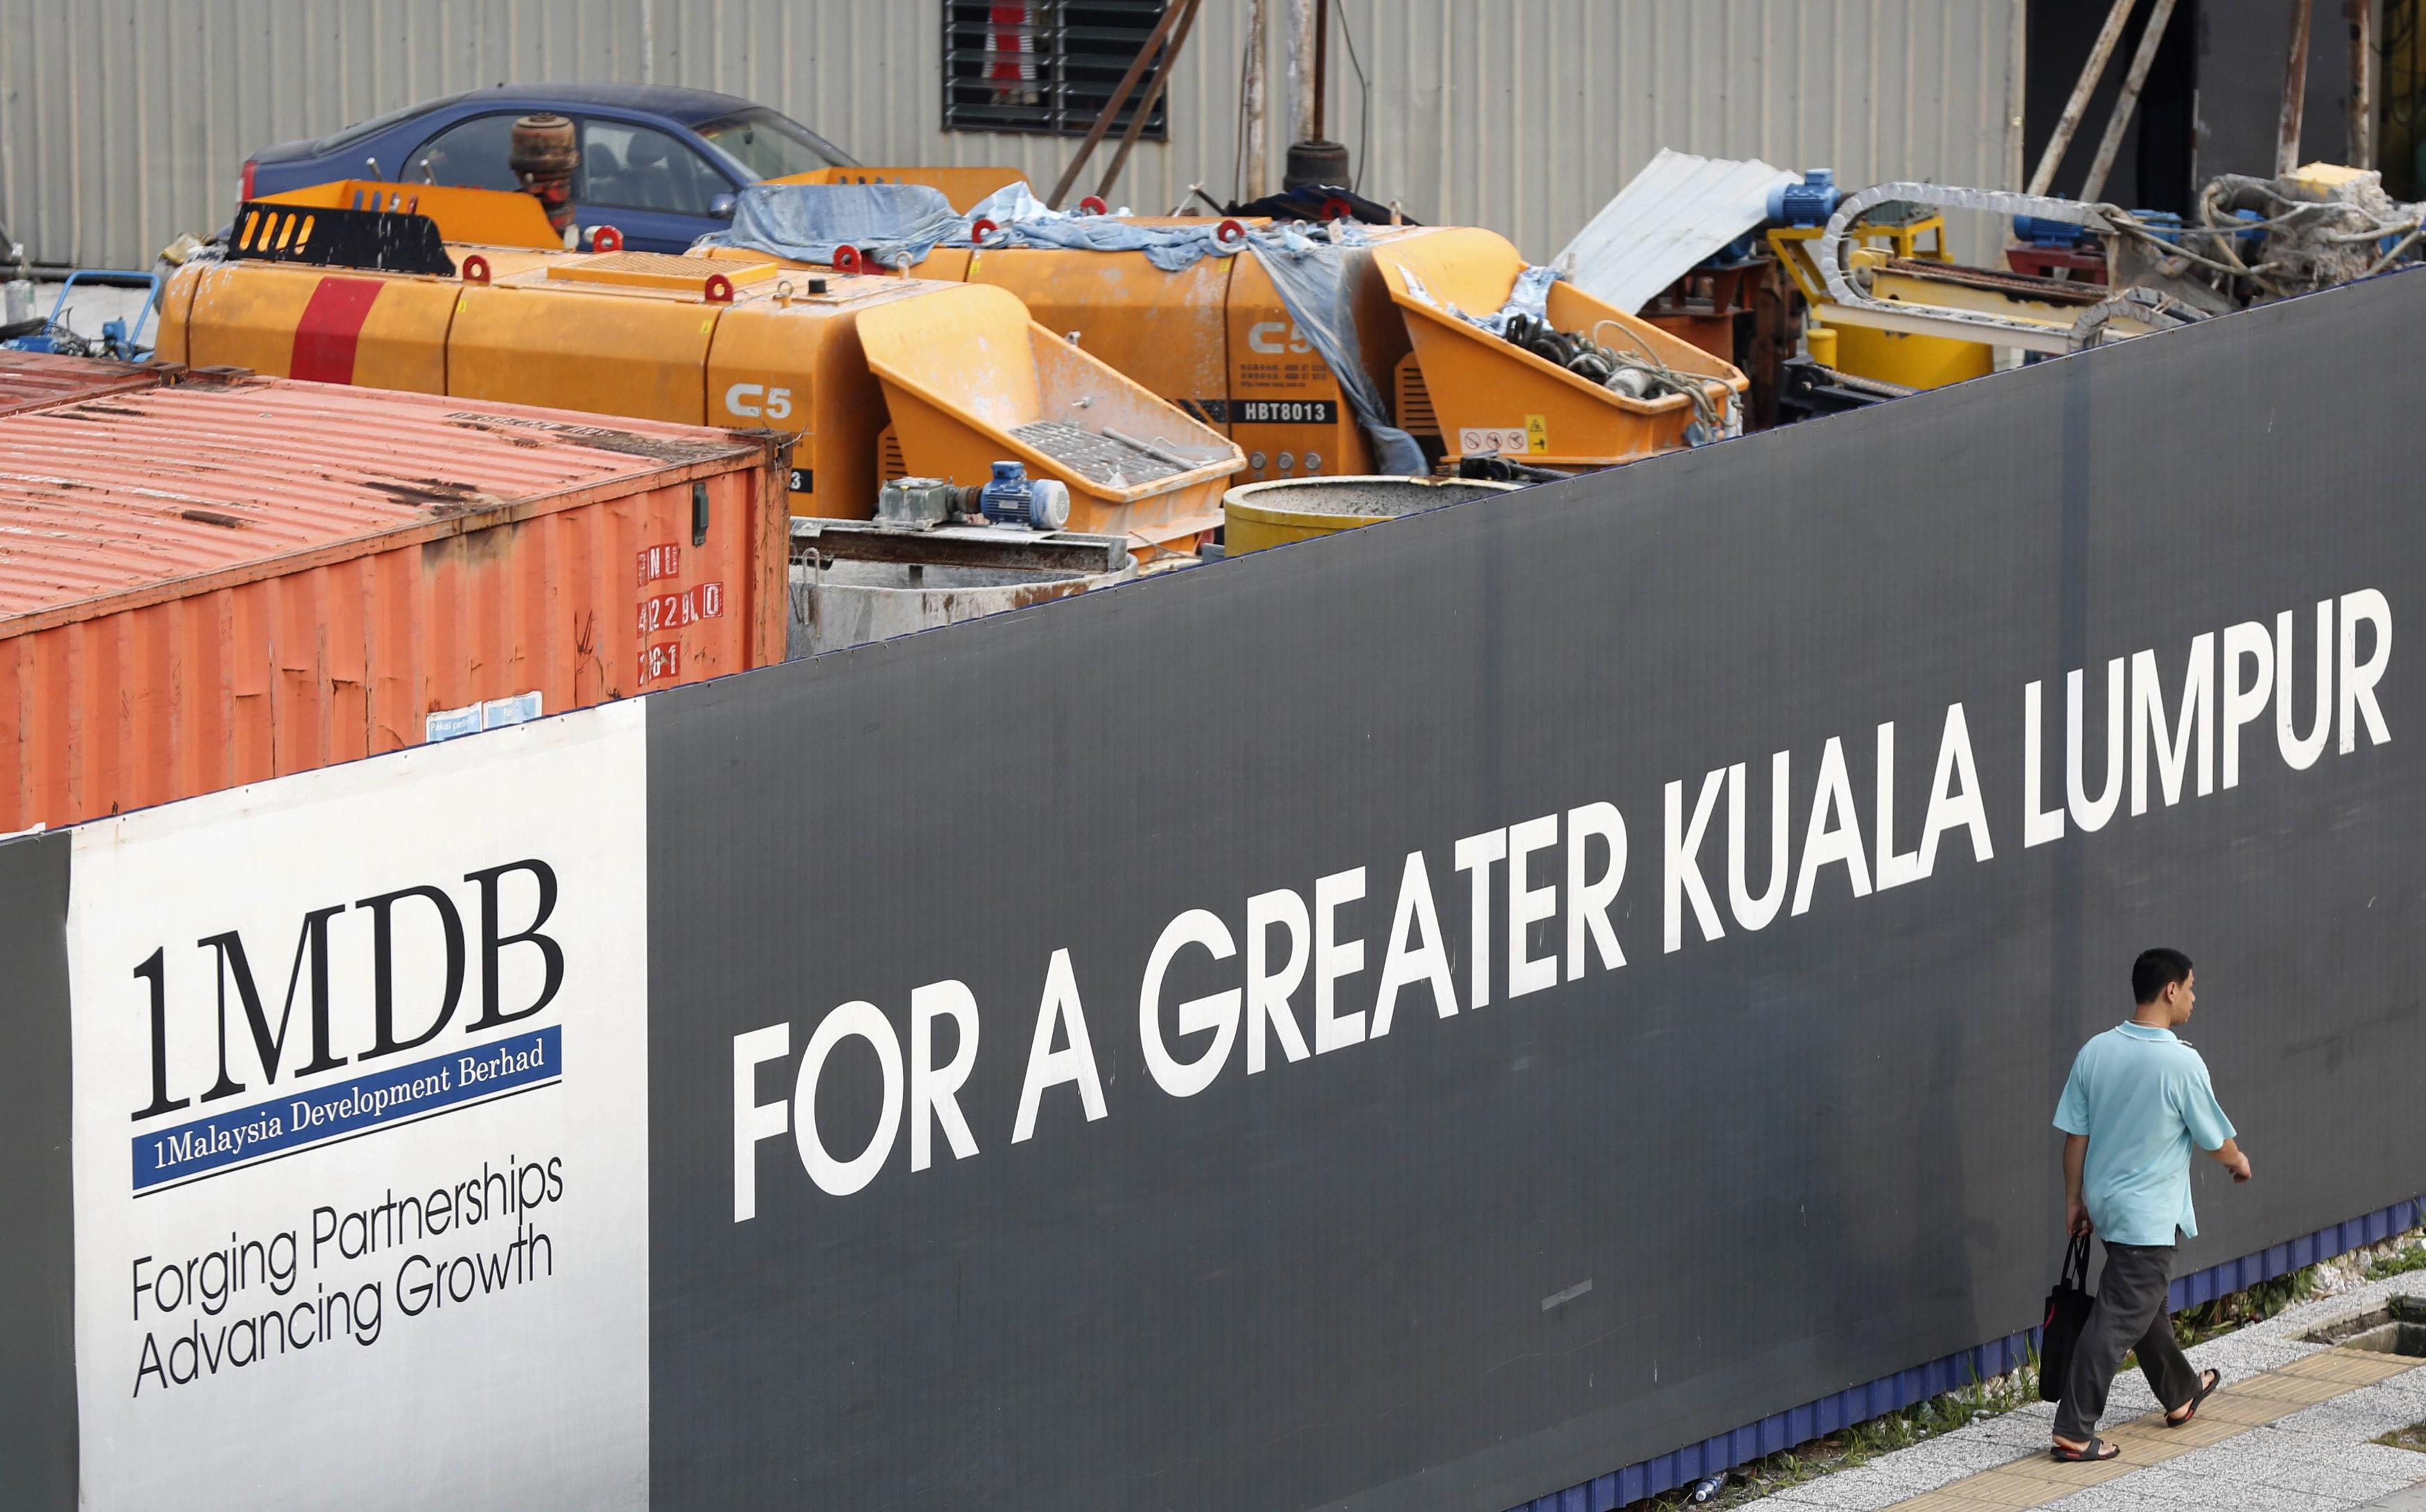 A man walks past a 1 Malaysia Development Berhad (1MDB) billboard at the funds flagship Tun Razak Exchange development in Kuala Lumpur, March 1, 2015. REUTERS/Olivia Harris